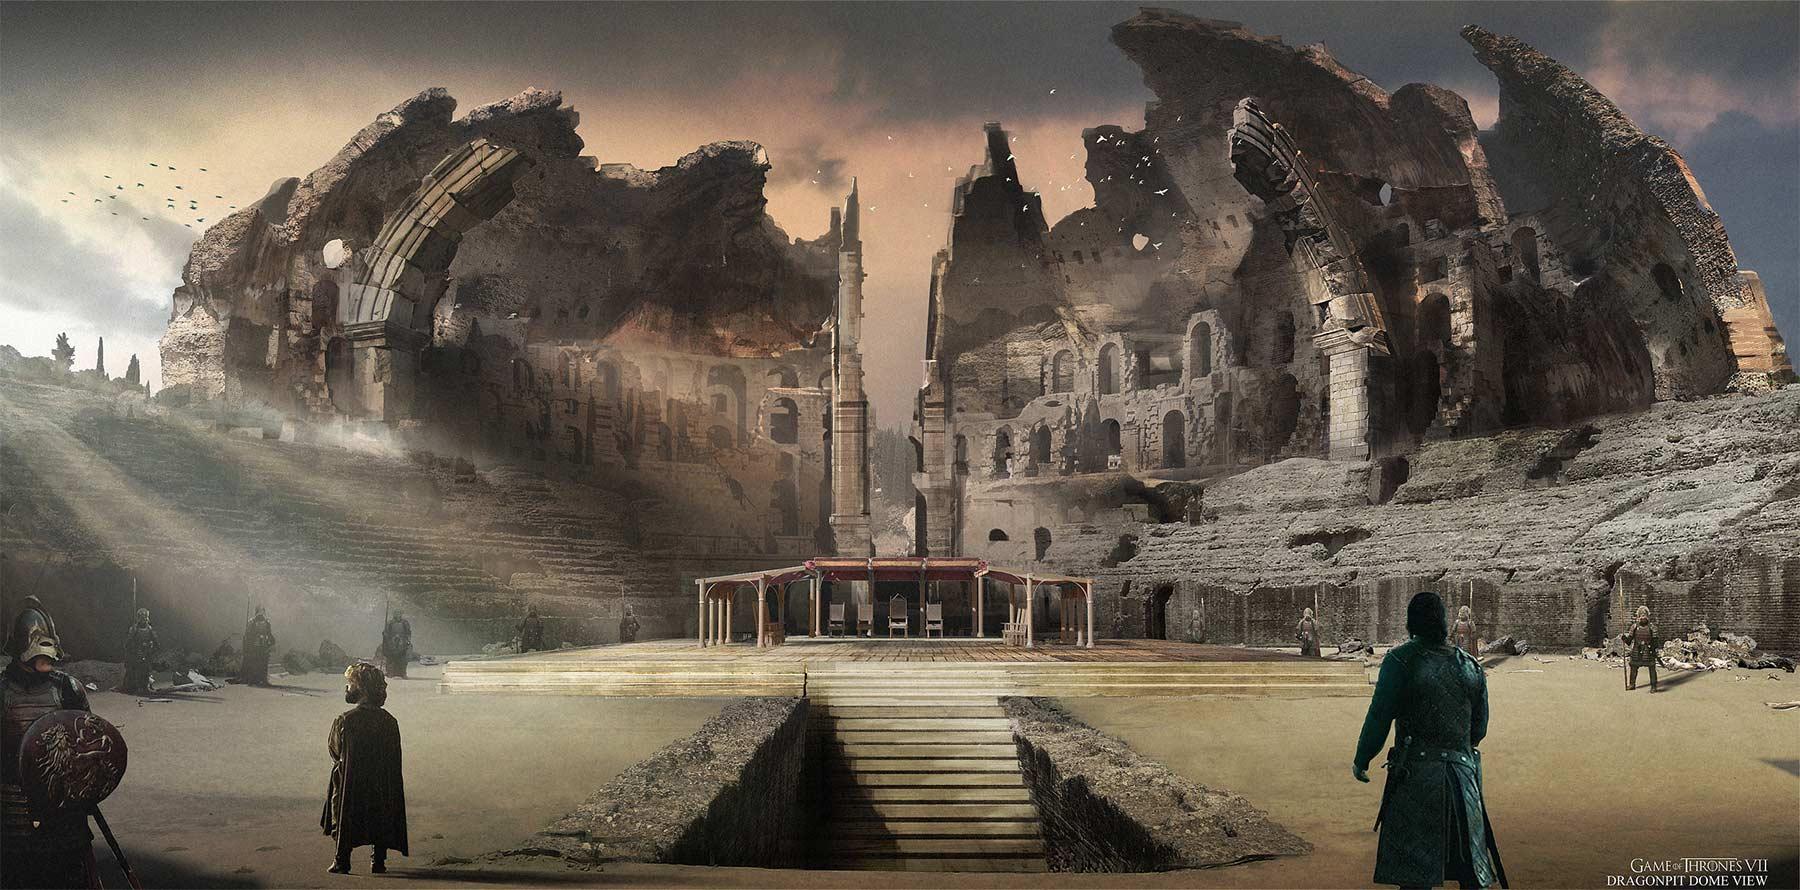 Game of Thrones Staffel 7 Concept Art Kieran-Belshaw-game-of-thrones-concept-art_08